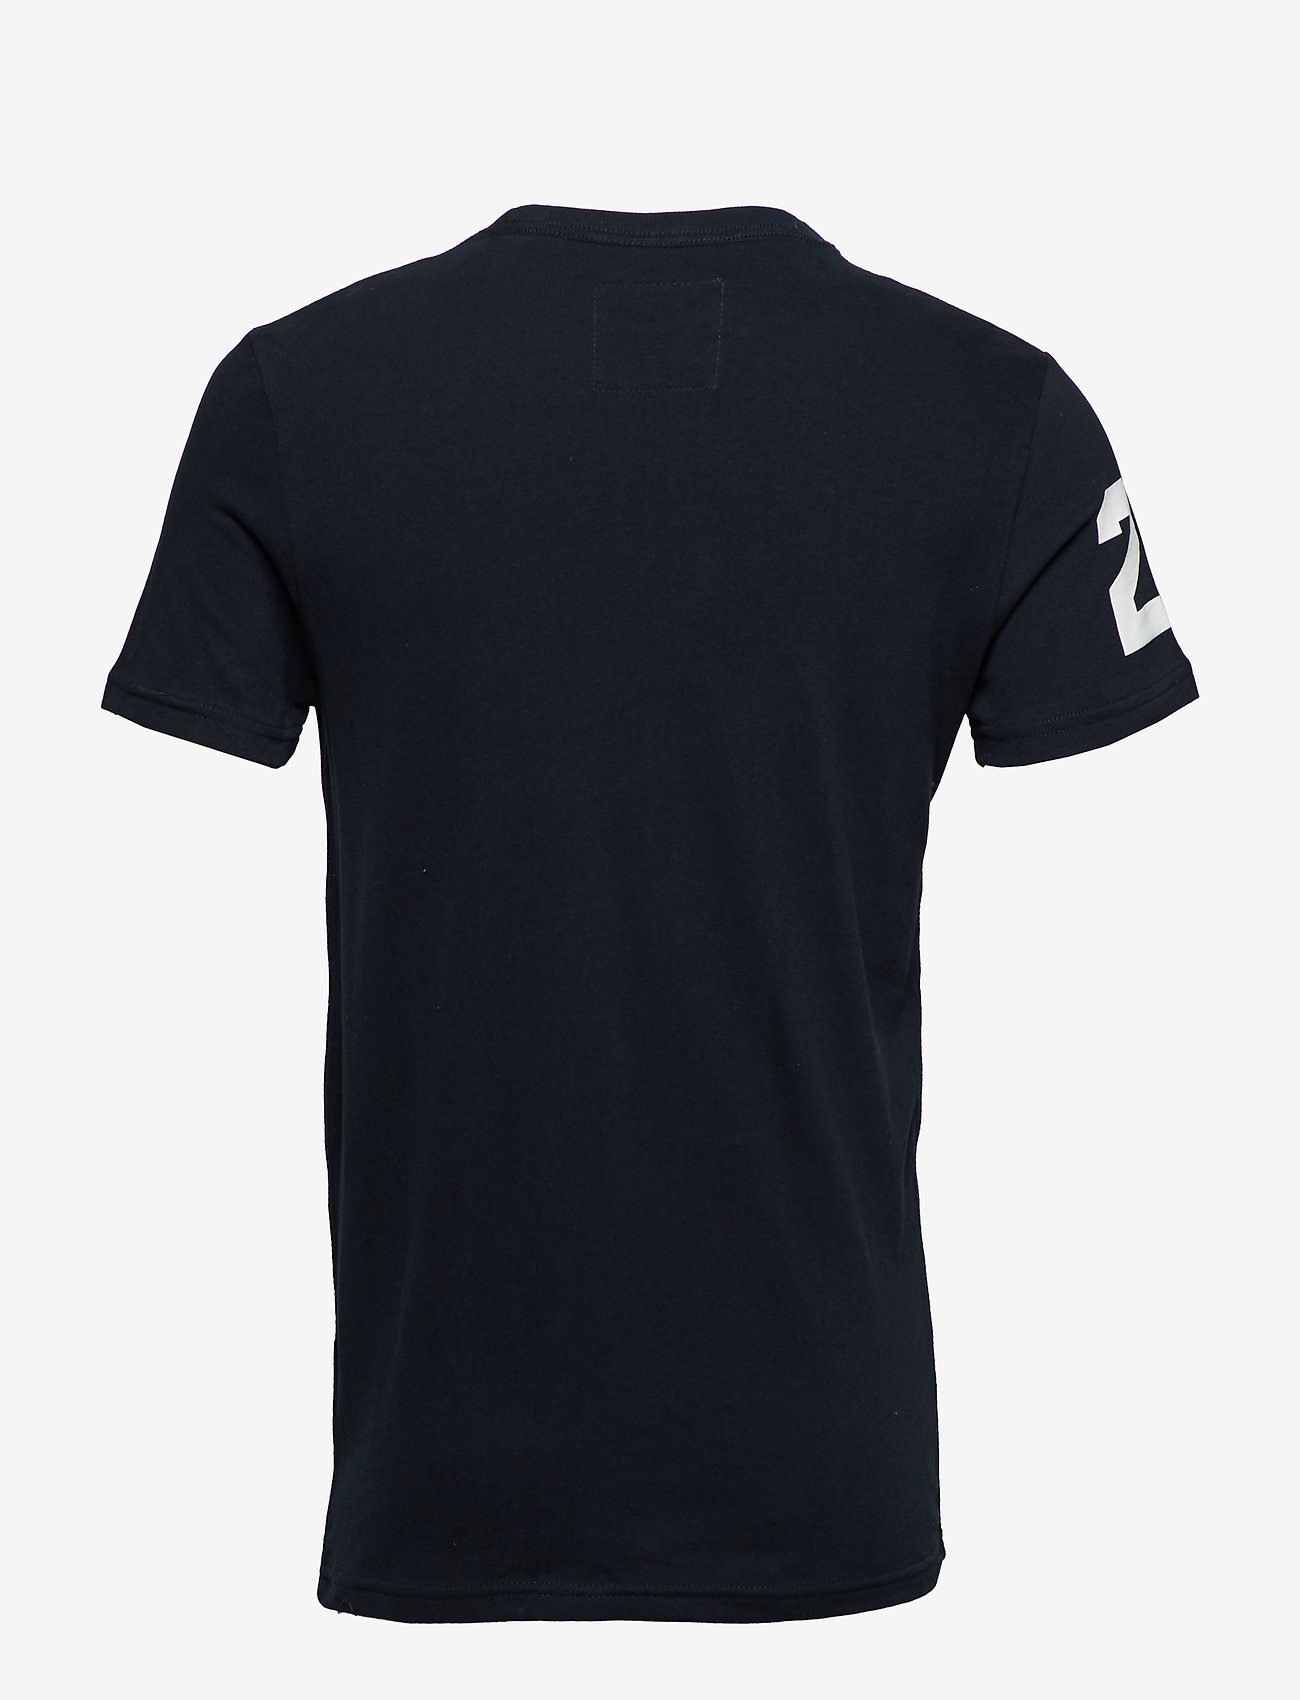 Superdry - VINTAGE LOGO TRI TEE - short-sleeved t-shirts - eclipse navy - 1